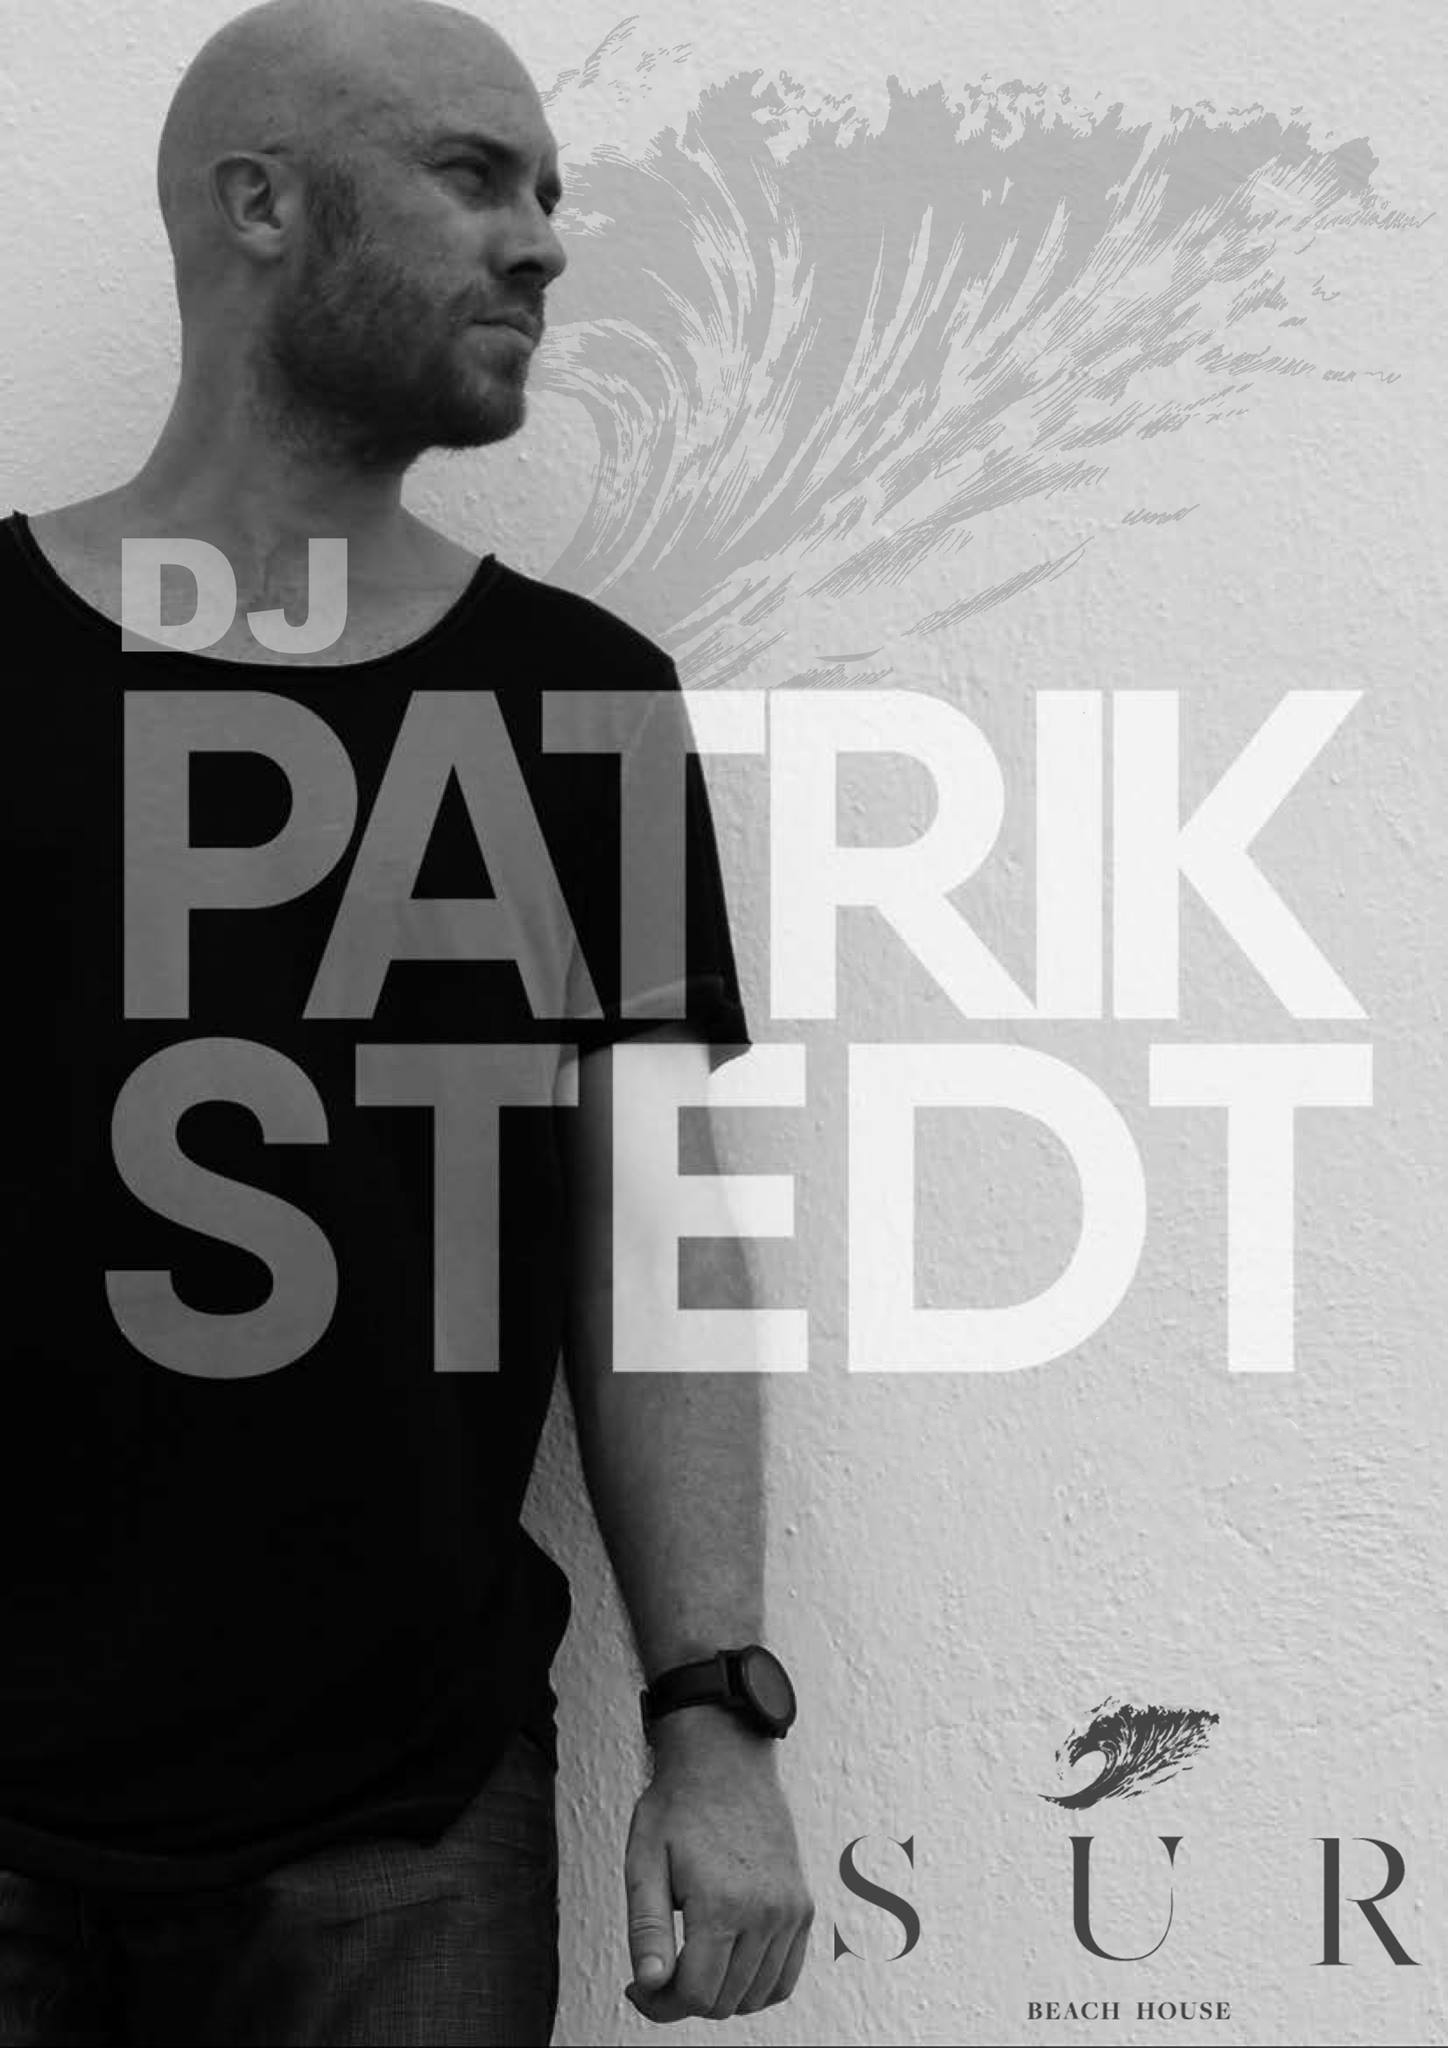 Patrick Stedt.jpg